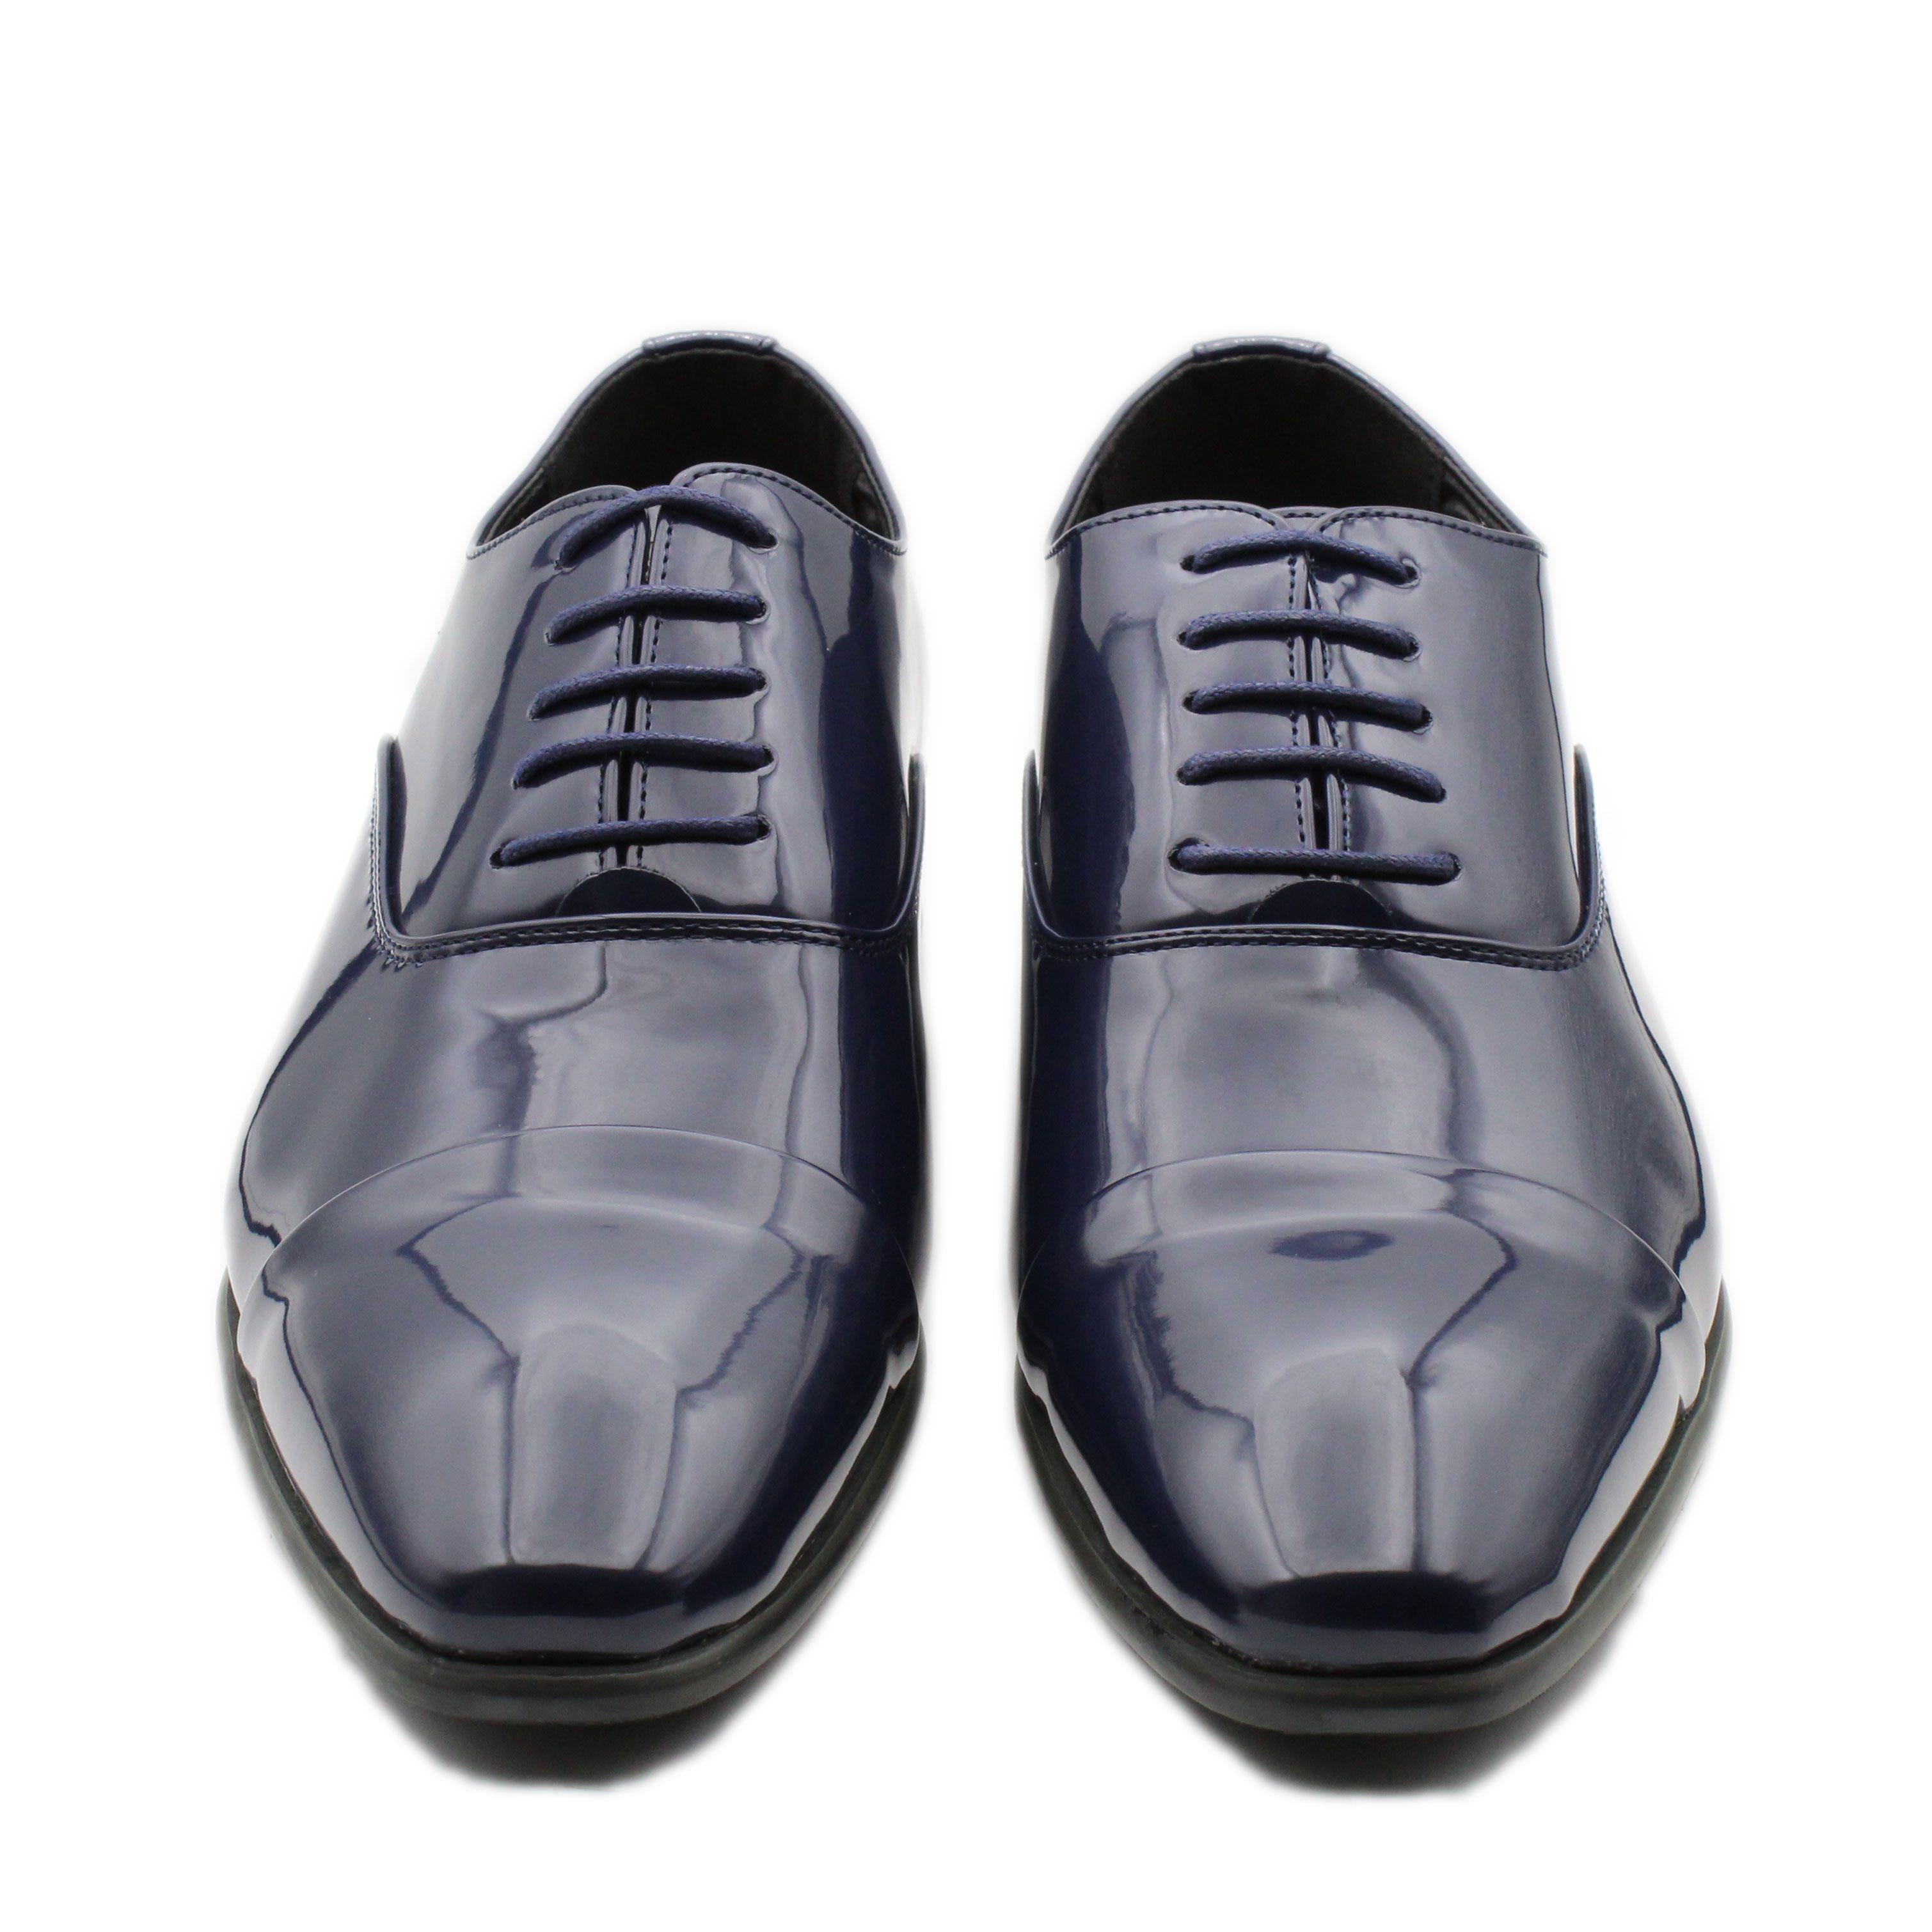 Scarpe-Uomo-Eleganti-Lucide-Blu-Estive-Francesine-Classiche-Cerimonia-Oxford miniatura 2